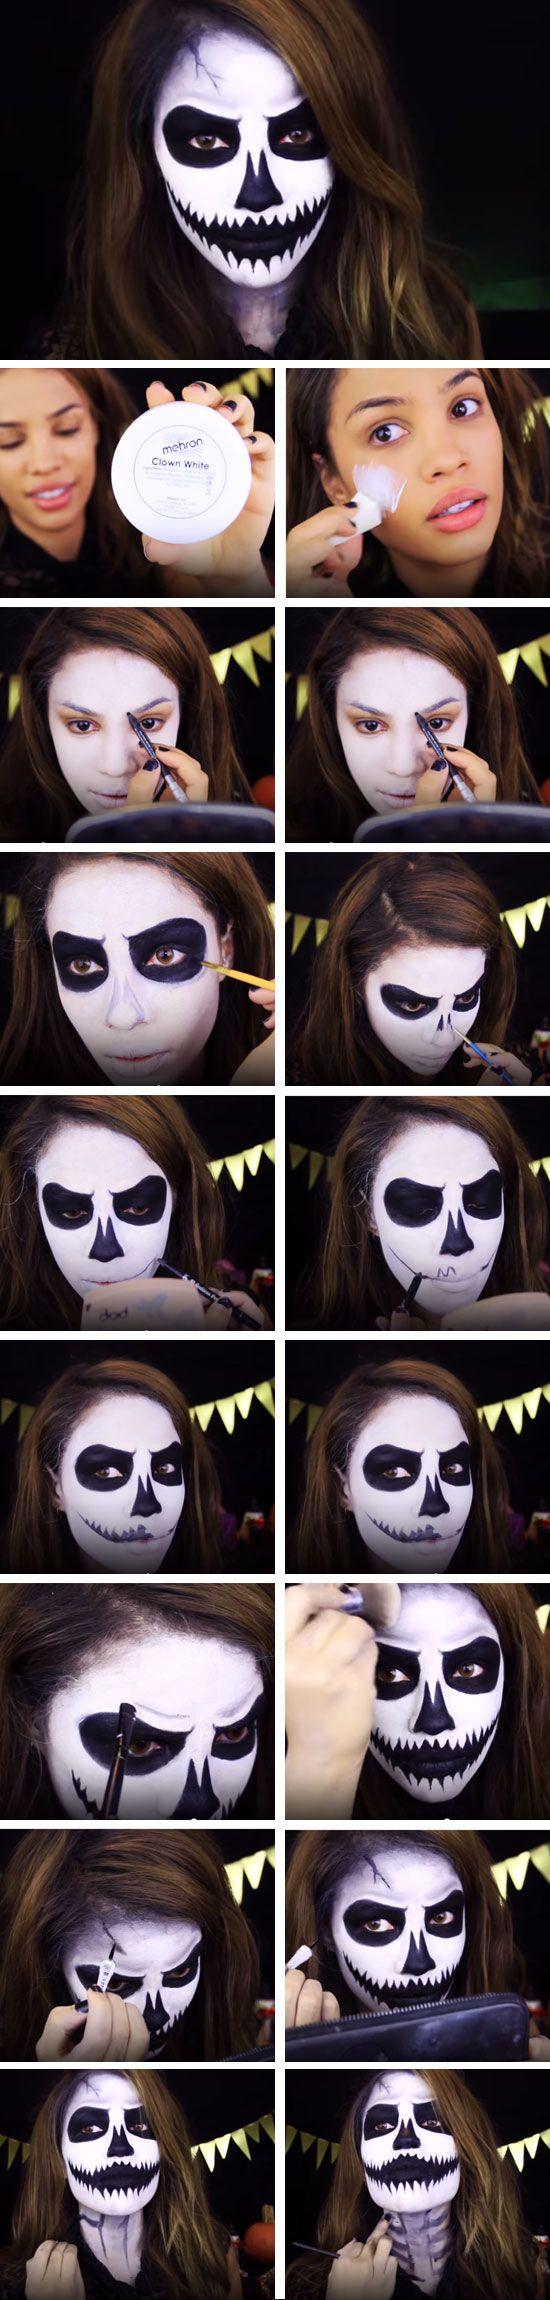 Gta 5 Face Paint : paint, Quick, Halloween, Costumes, Women, Makeup, Scary,, Makeup,, Tutorial